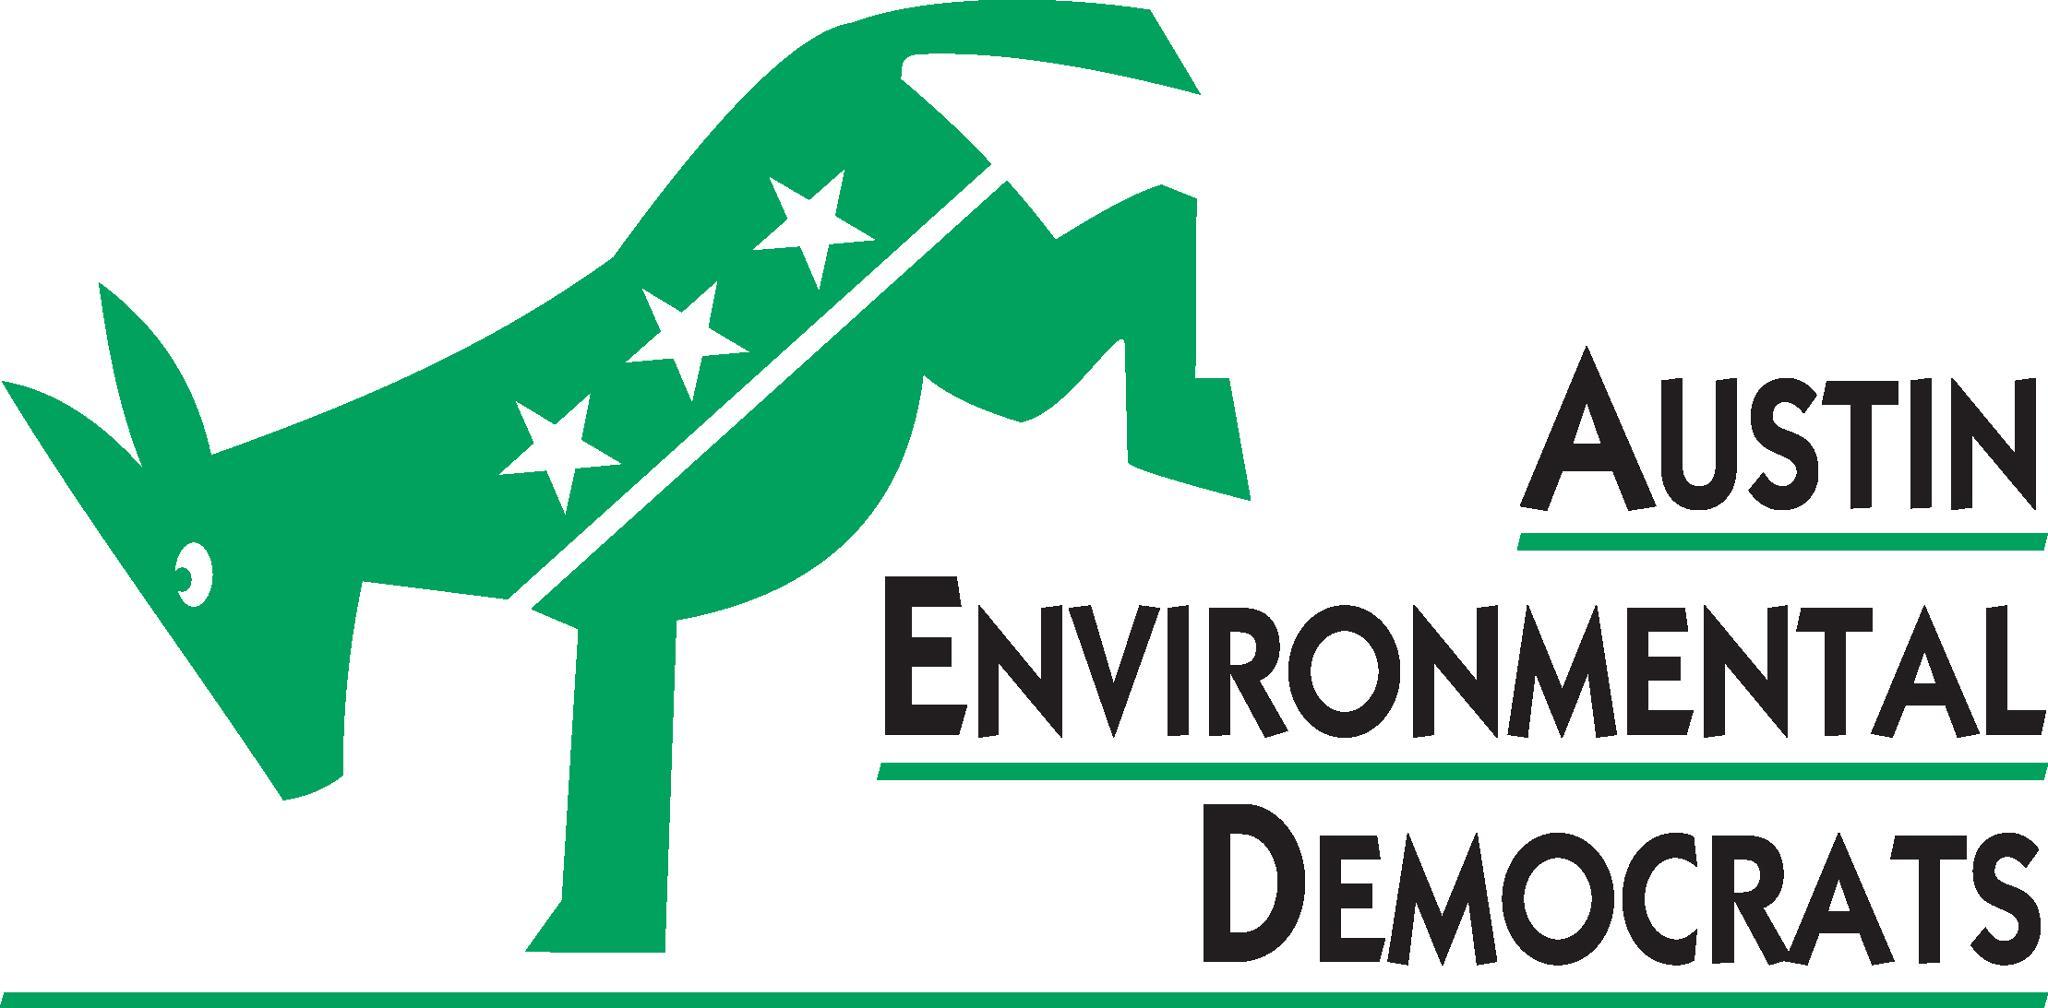 Austin Environmental Democrats.jpg